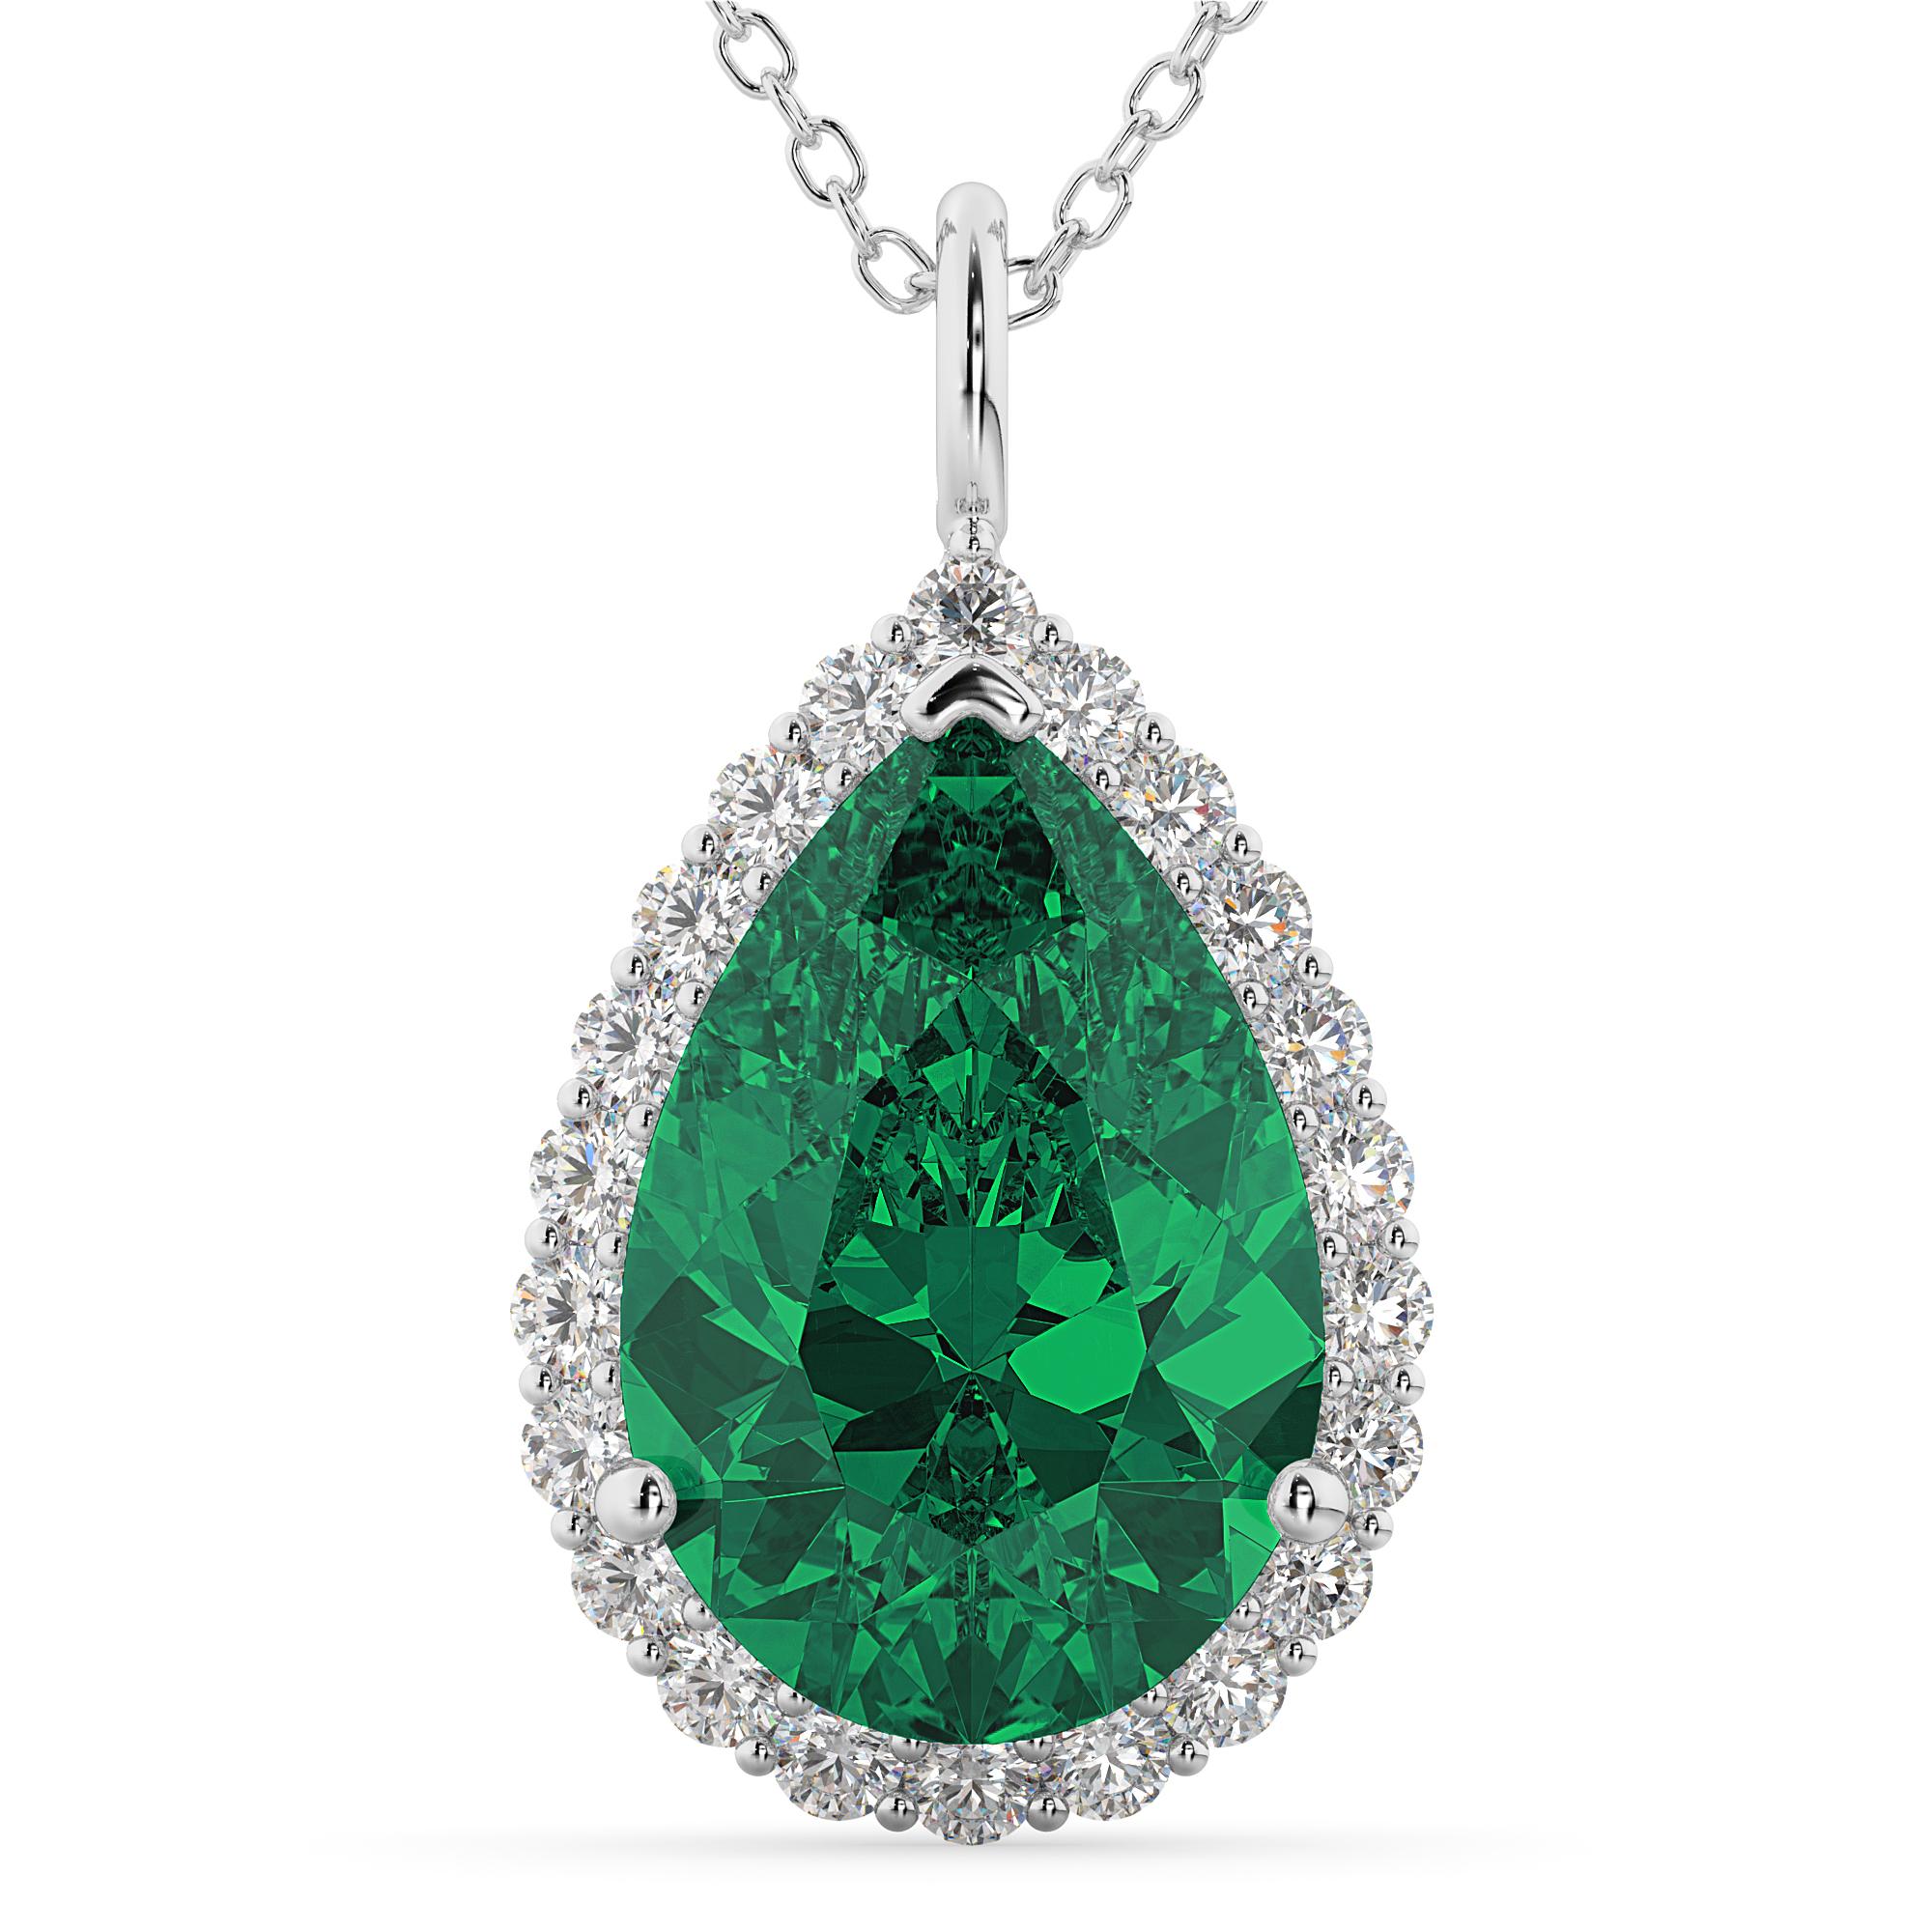 Halo Emerald Amp Diamond Pear Shaped Pendant Necklace 14k